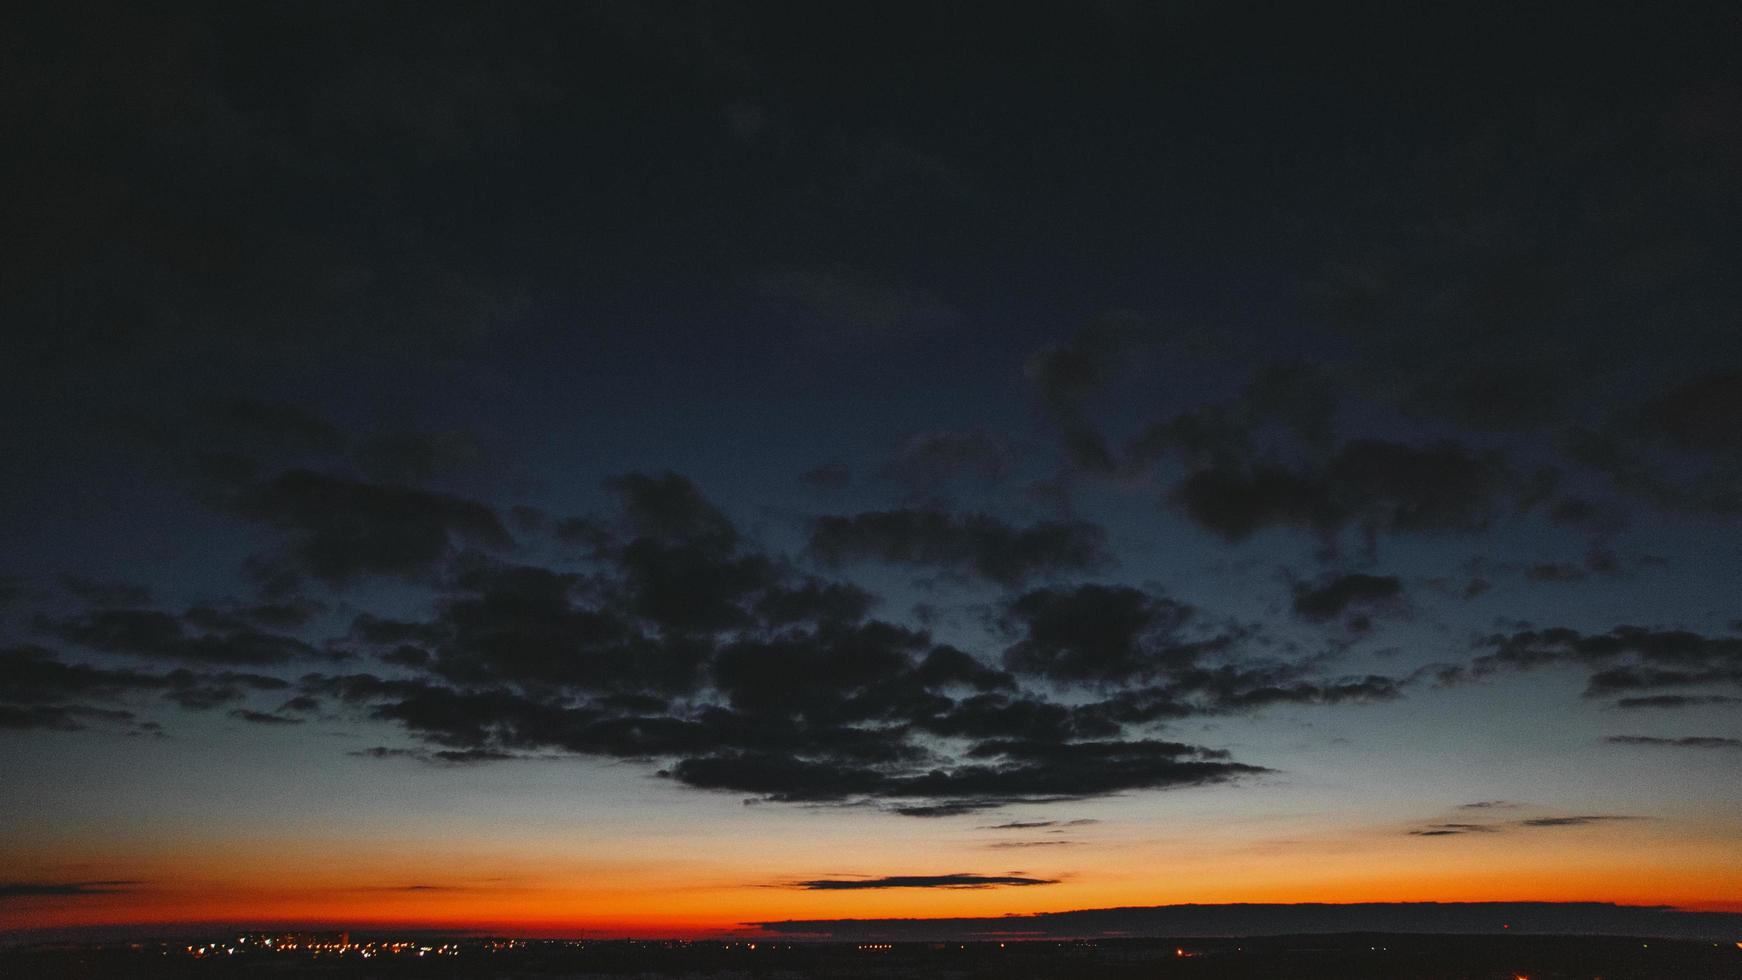 Sonnenuntergang über dem Horizont foto